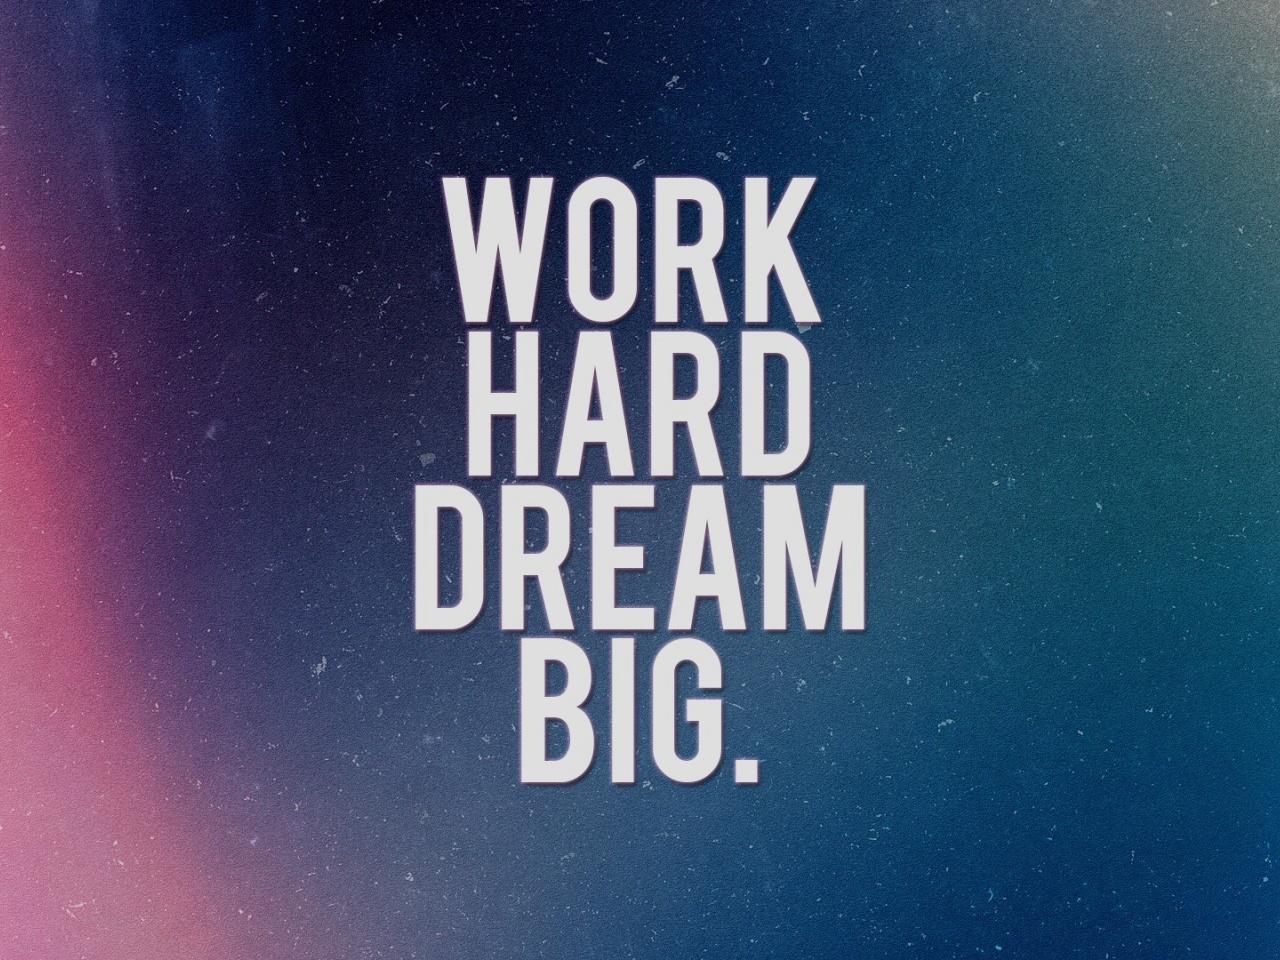 1280x960 Work Hard Dream Big desktop PC and Mac wallpaper 1280x960